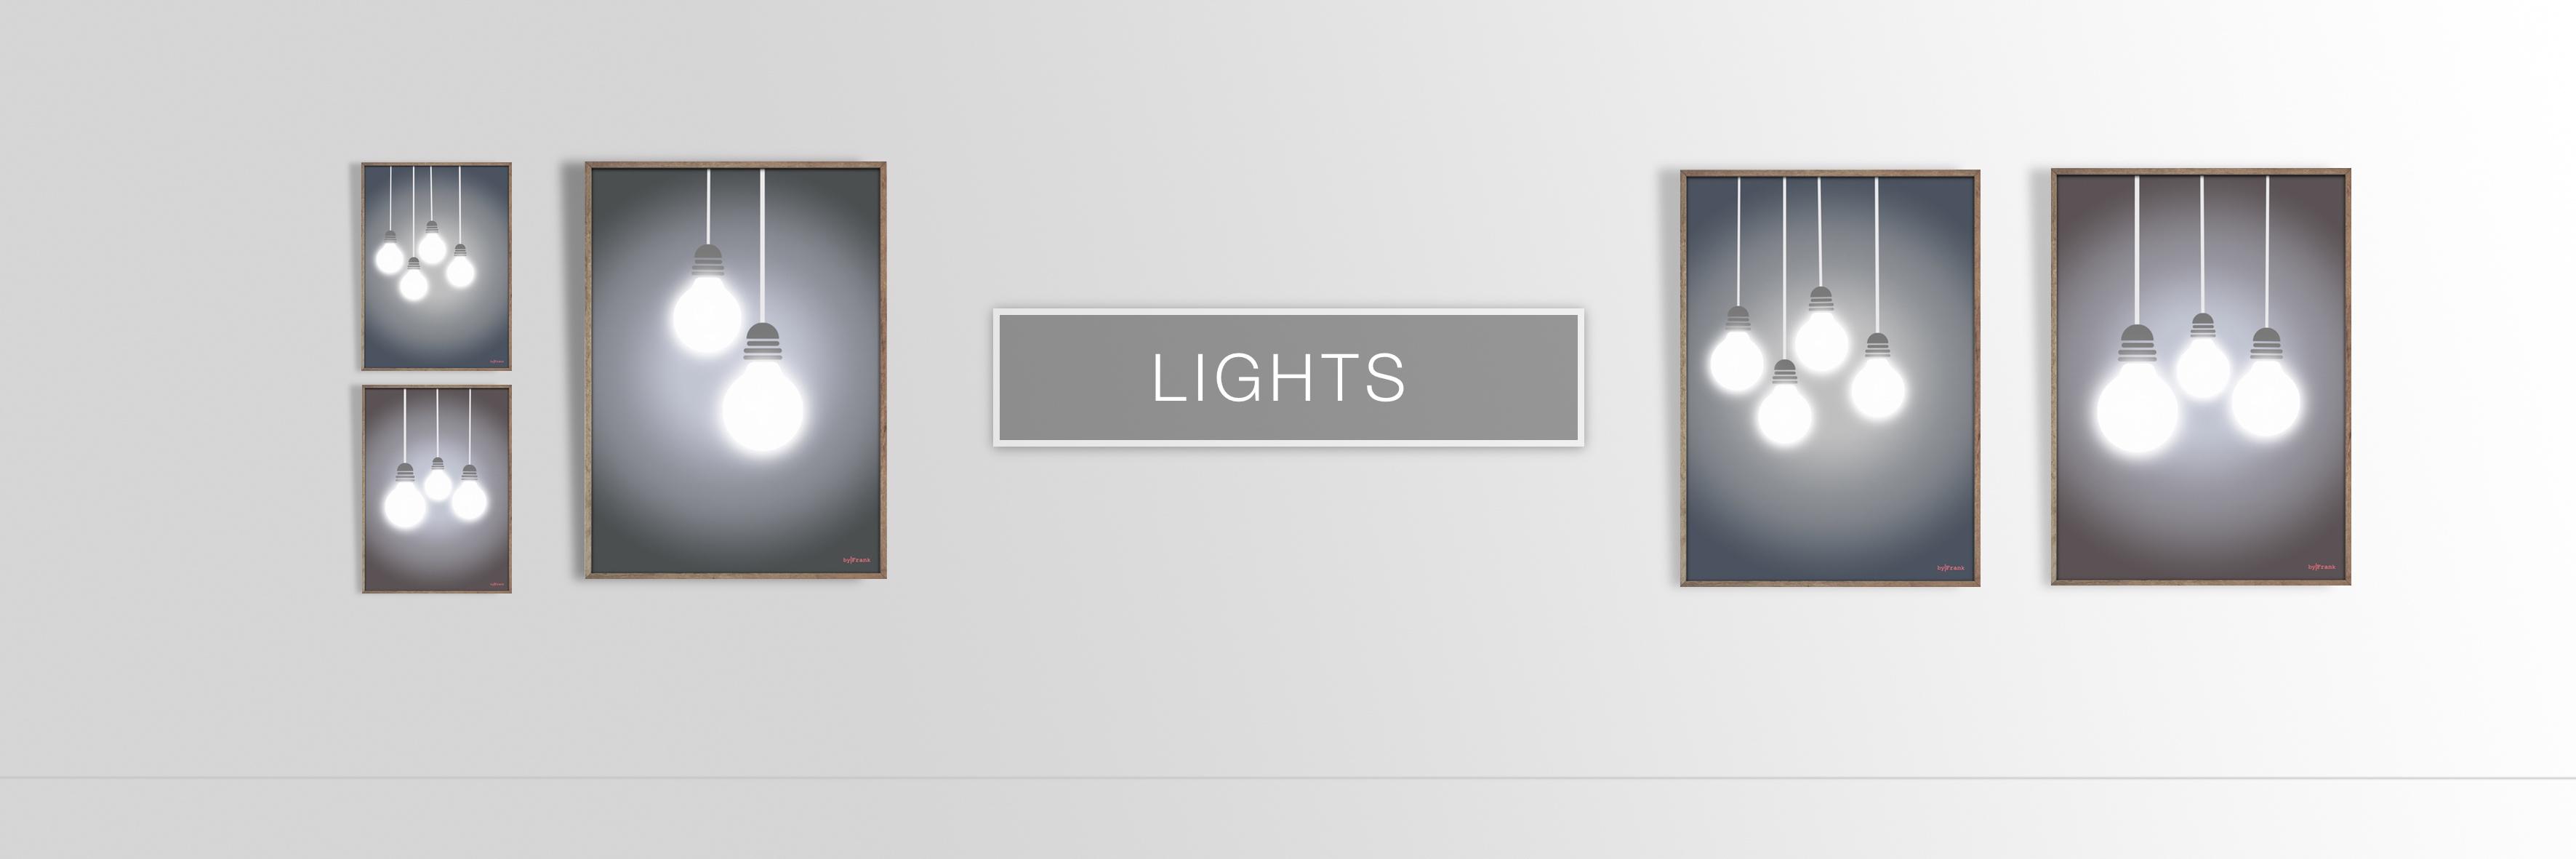 lights-banner